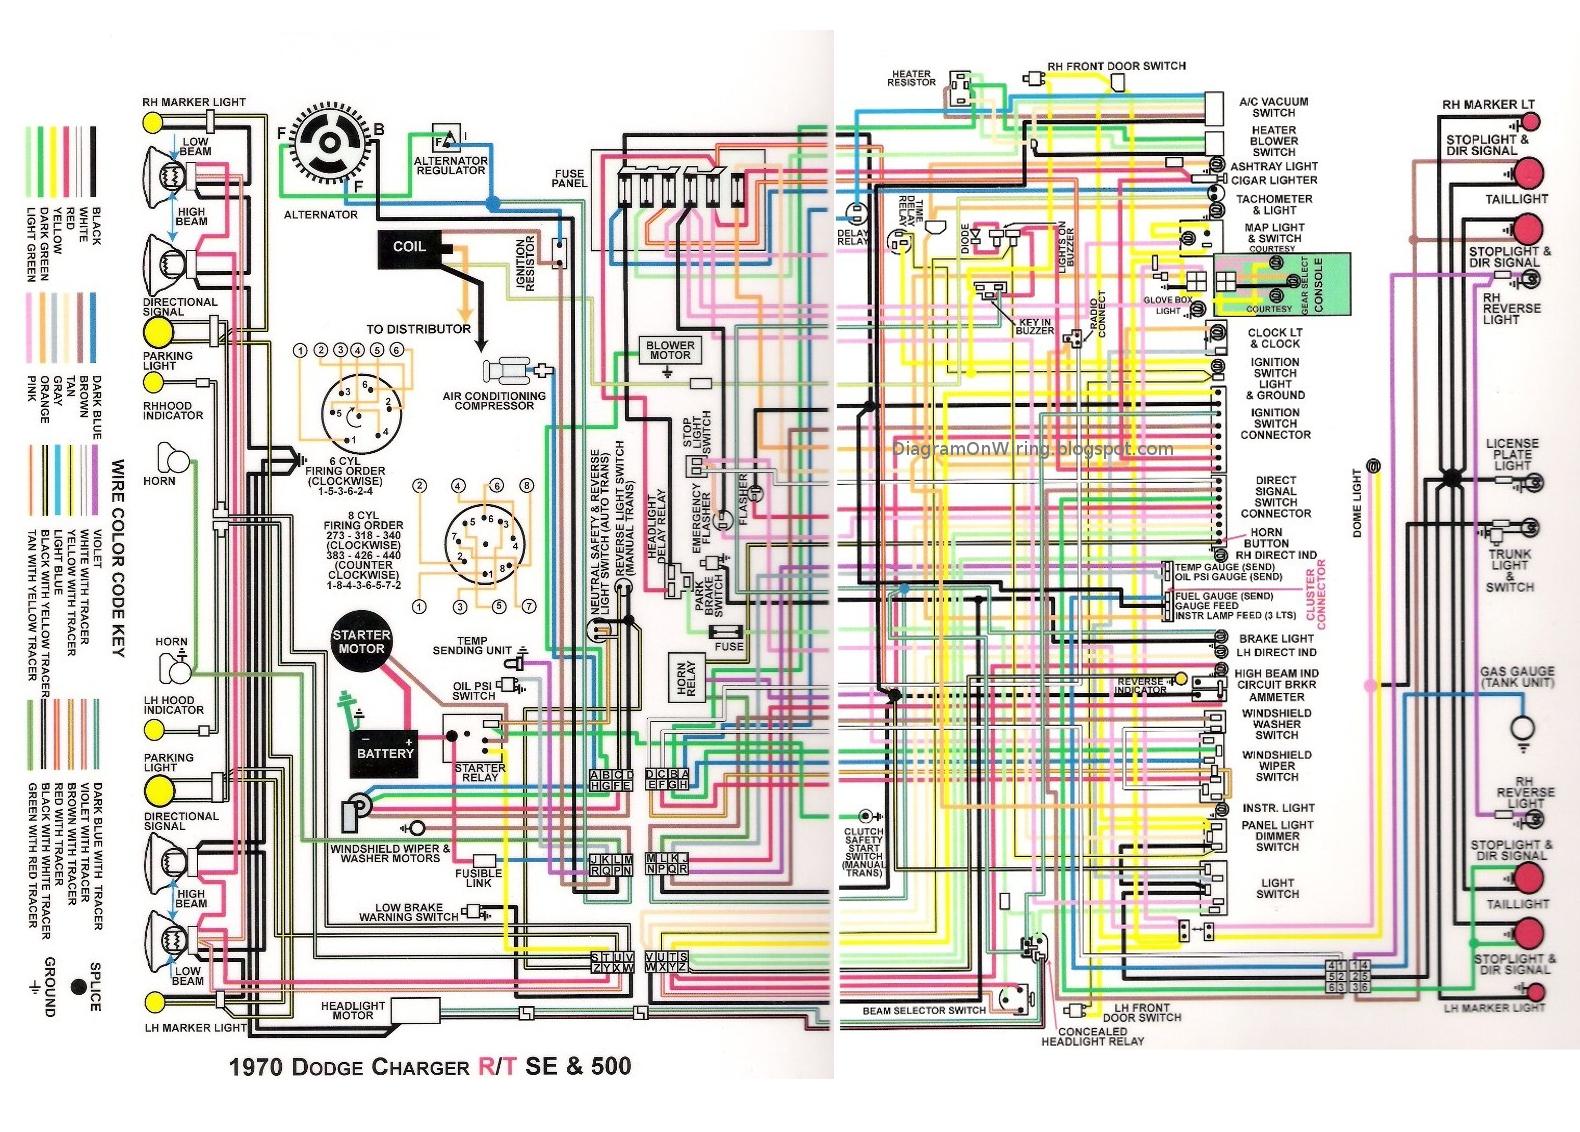 Chrysler Diagrams